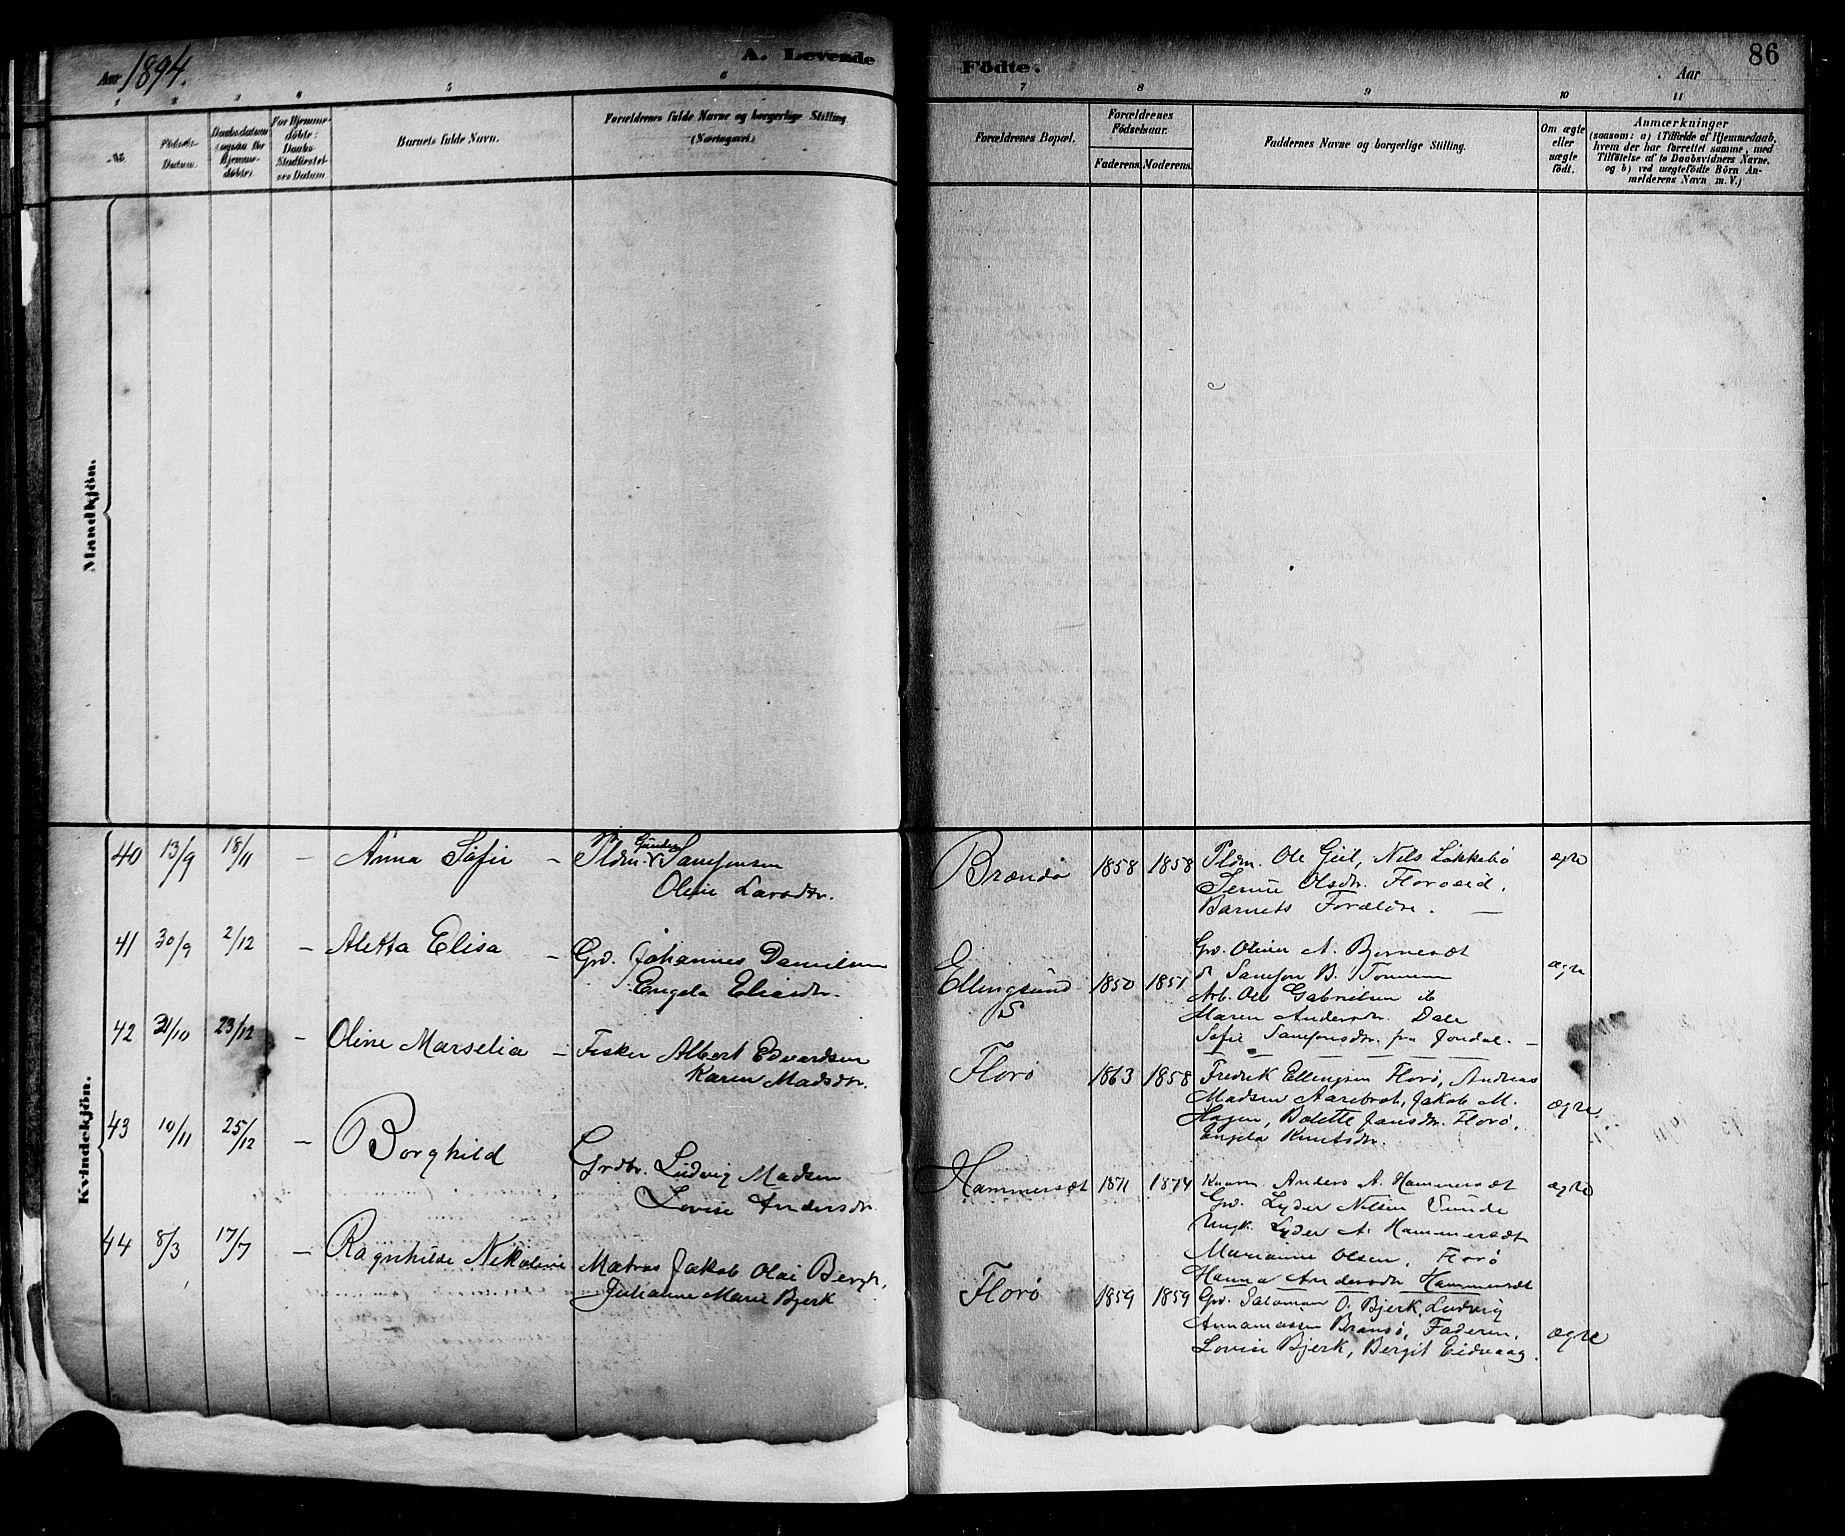 SAB, Kinn sokneprestembete, H/Hab: Parish register (copy) no. A 2, 1882-1906, p. 86